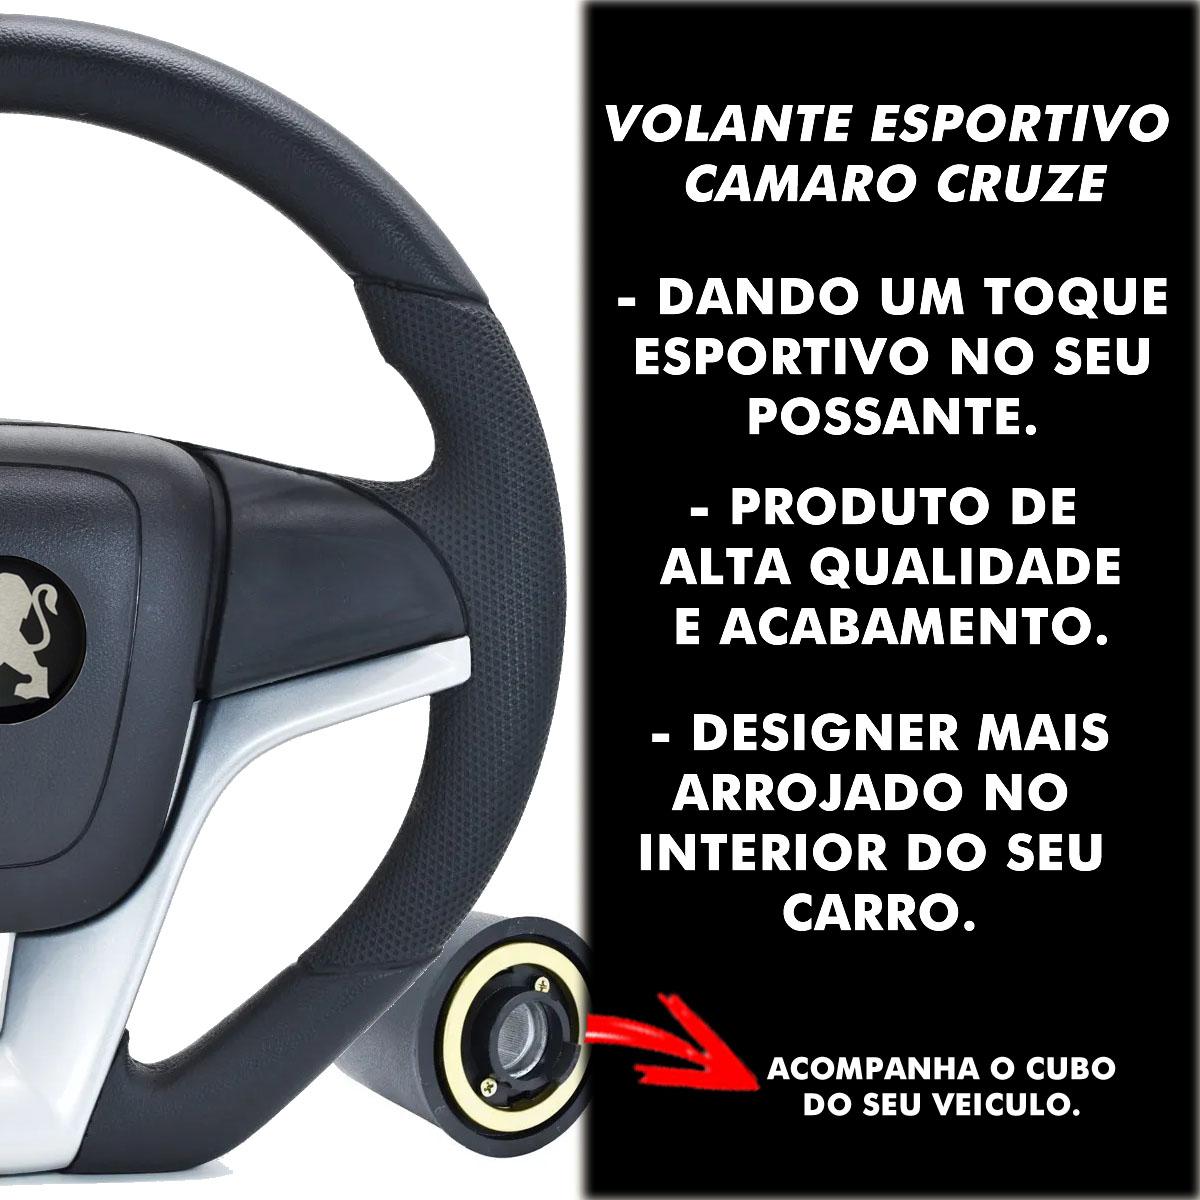 Volante Peugeot Mk7 Esportivo Cubo Atacado Poliparts